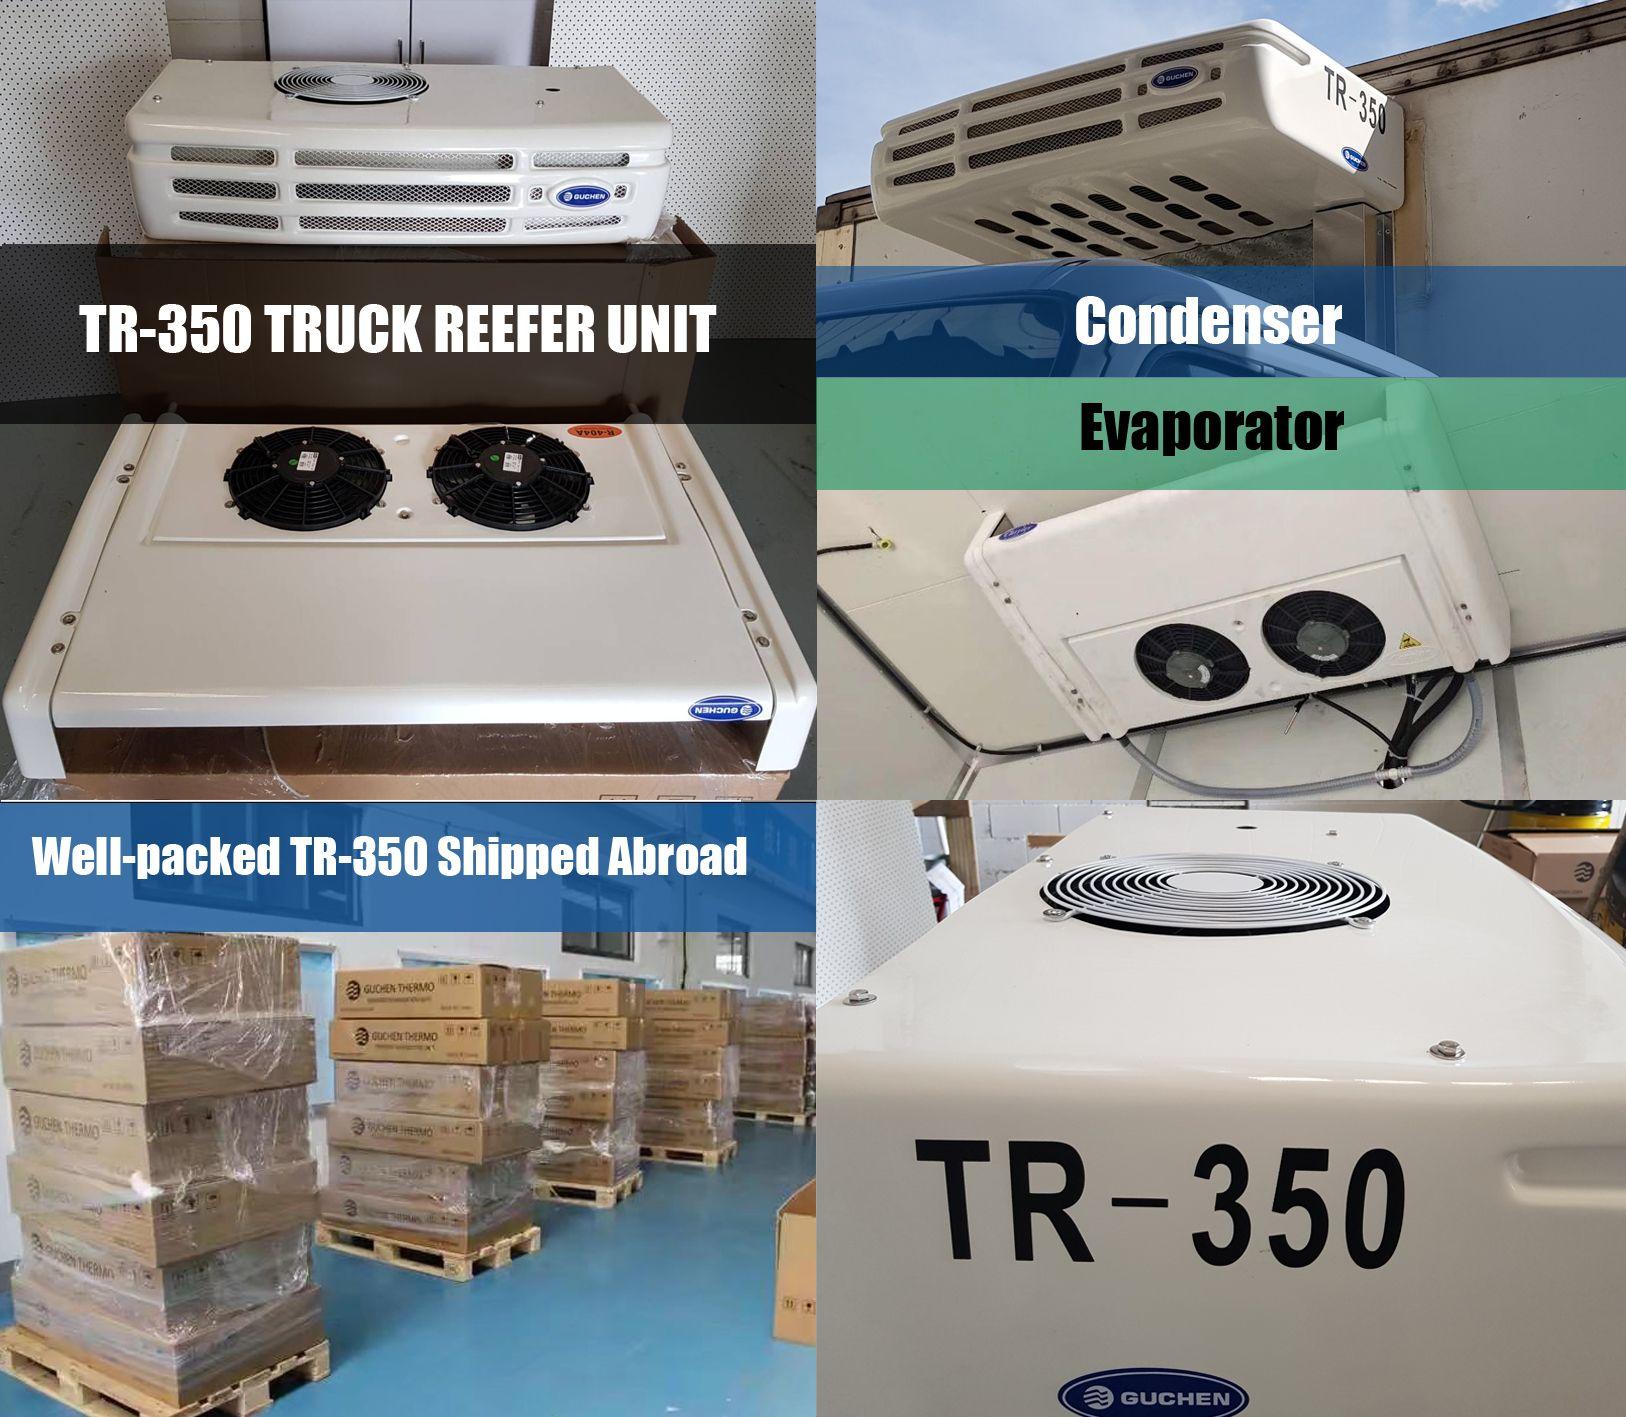 Pin on Truck Refrigeration Units